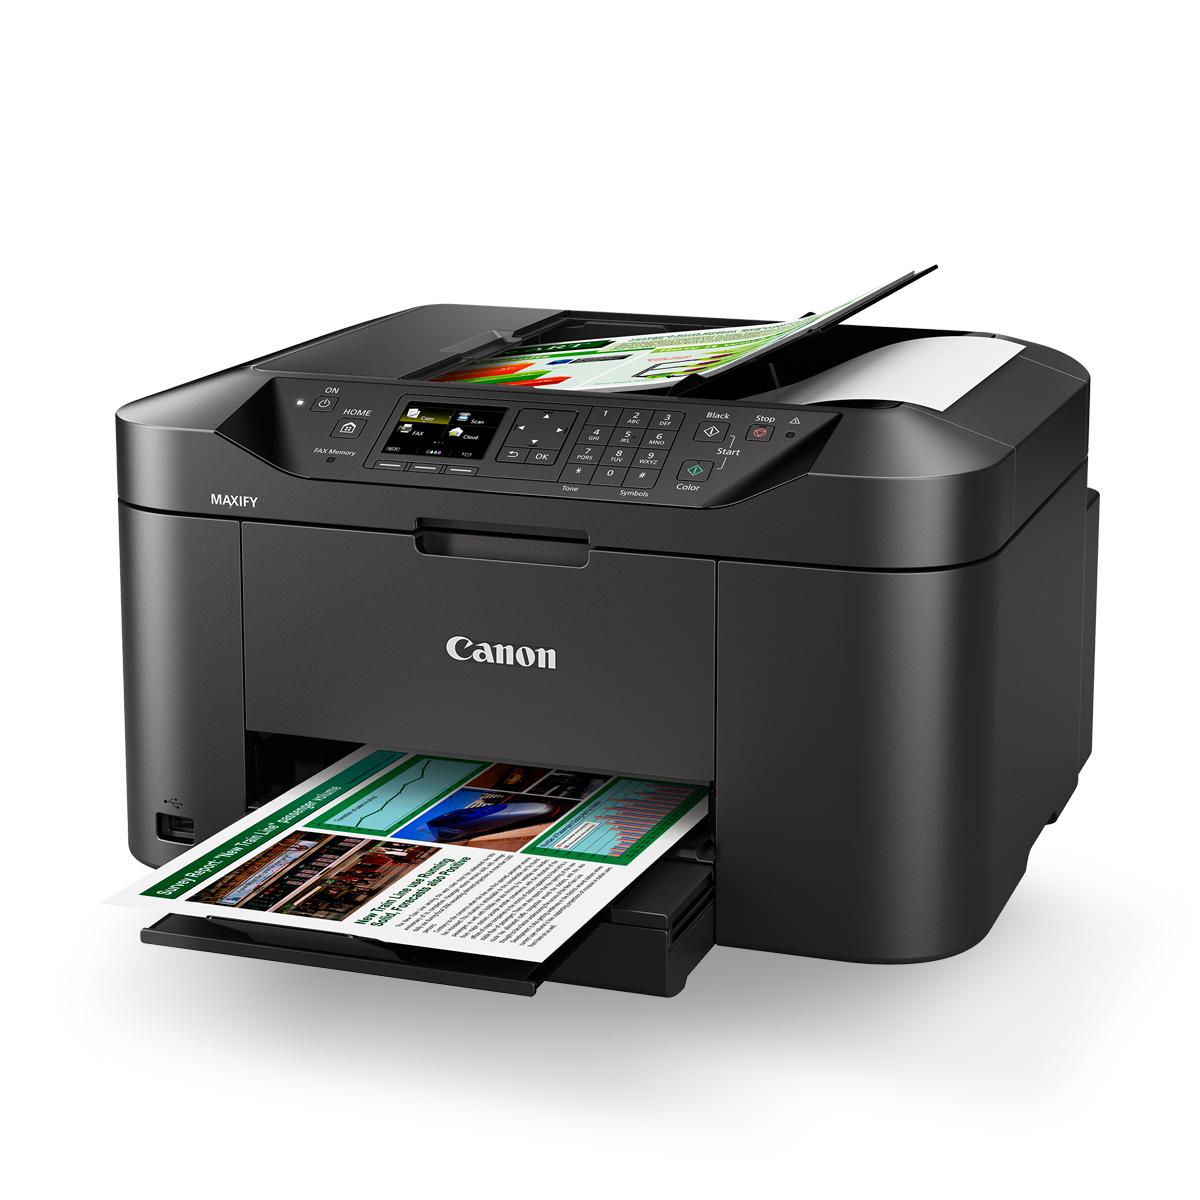 Canon MAXIFY MB2060 printer